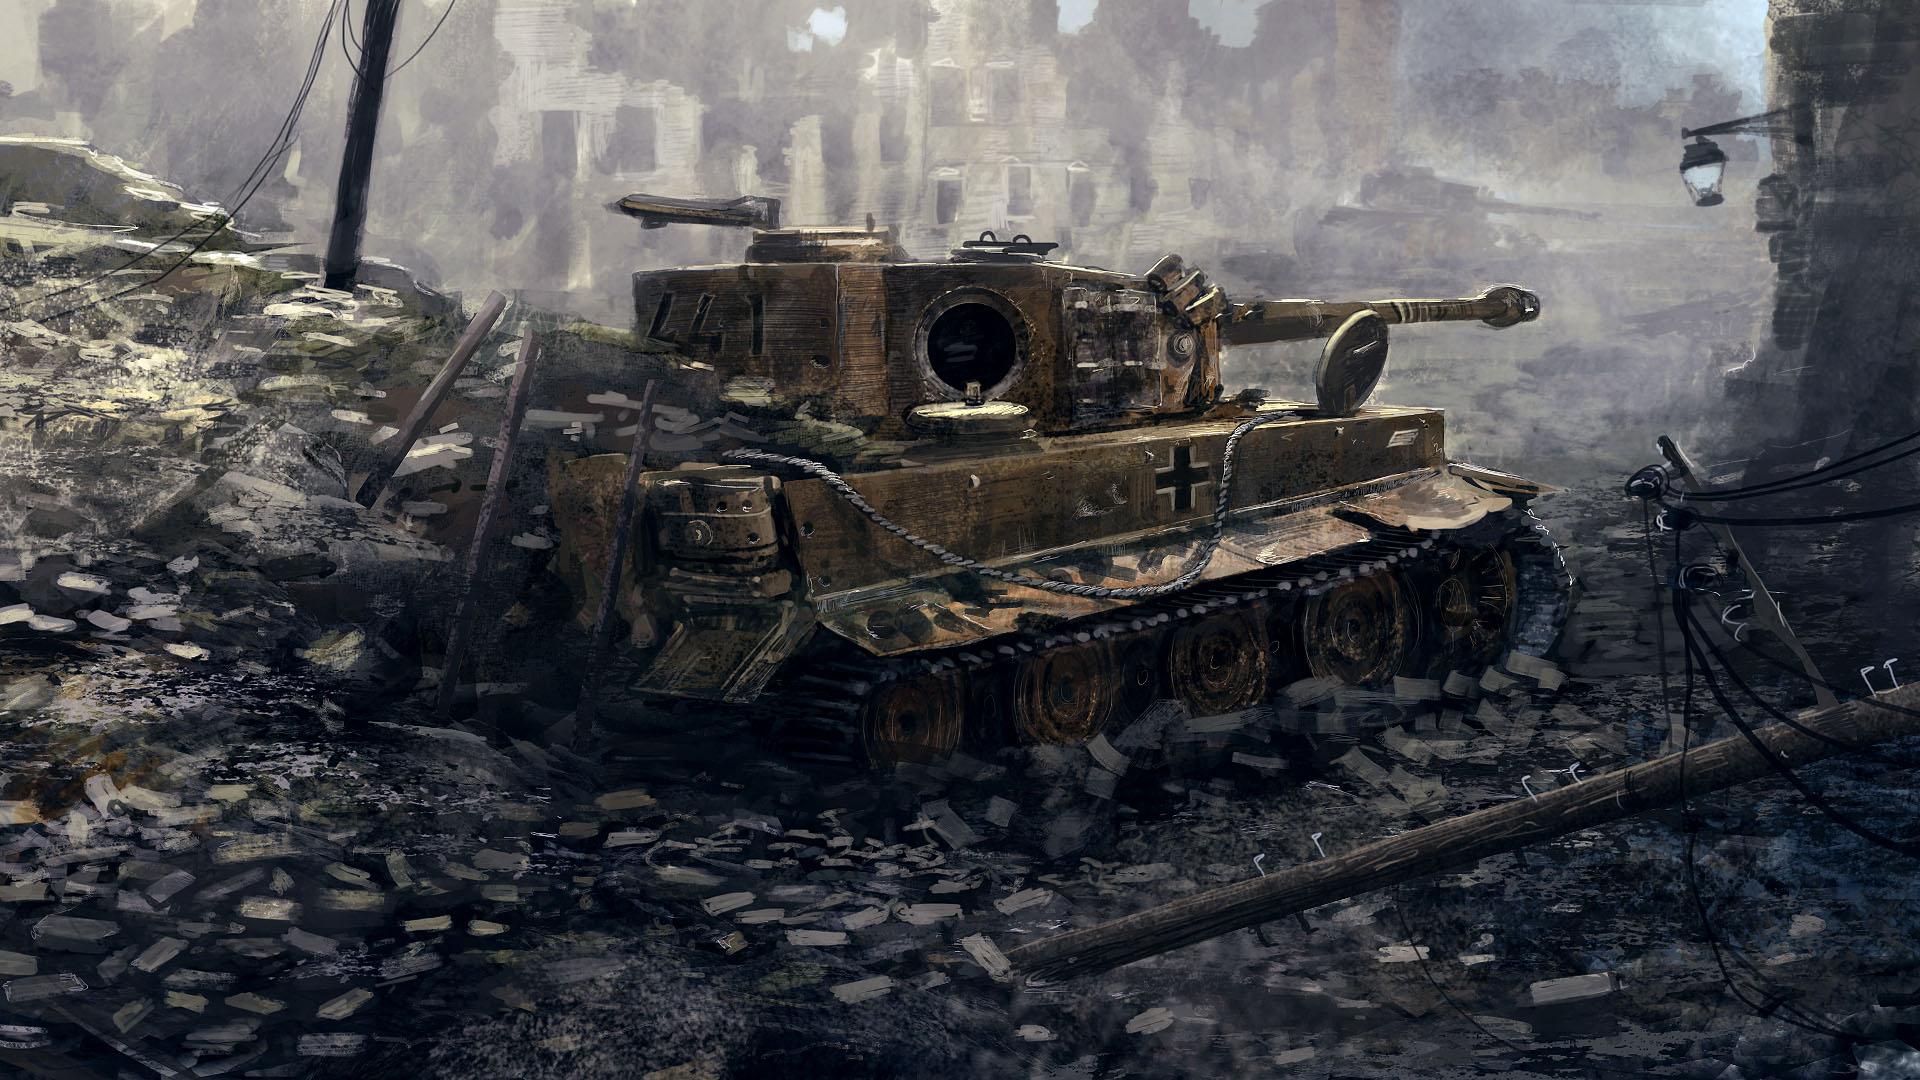 tiger tank wallpaper HD – wallpapermonkey com